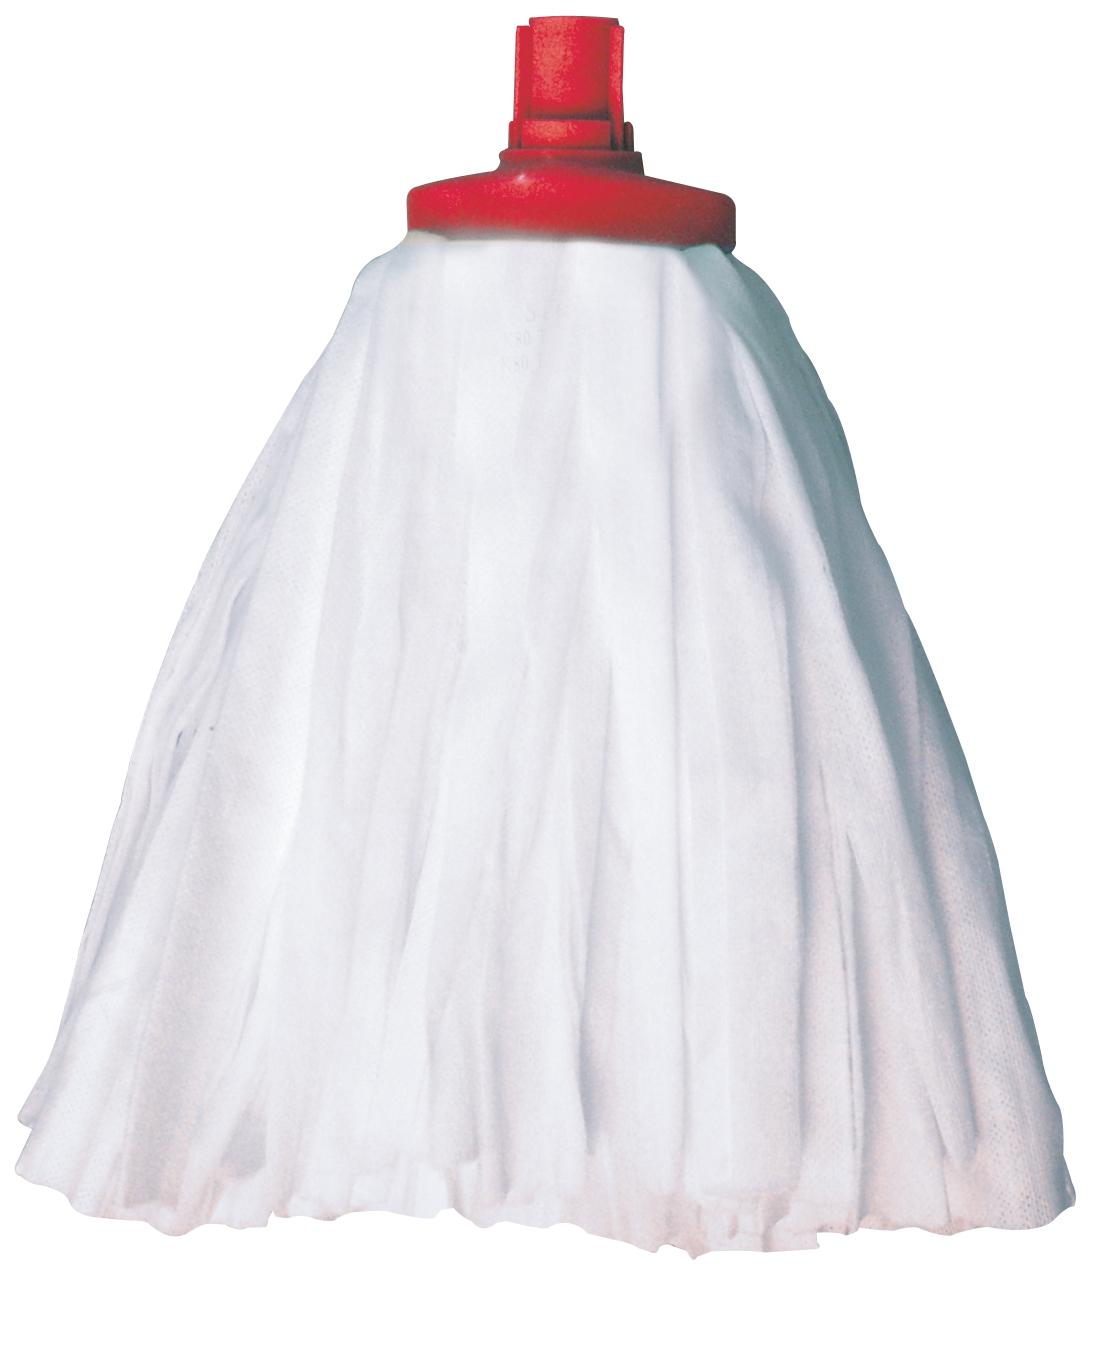 Spun Lace Mophead Midi Red Socket 005/104037